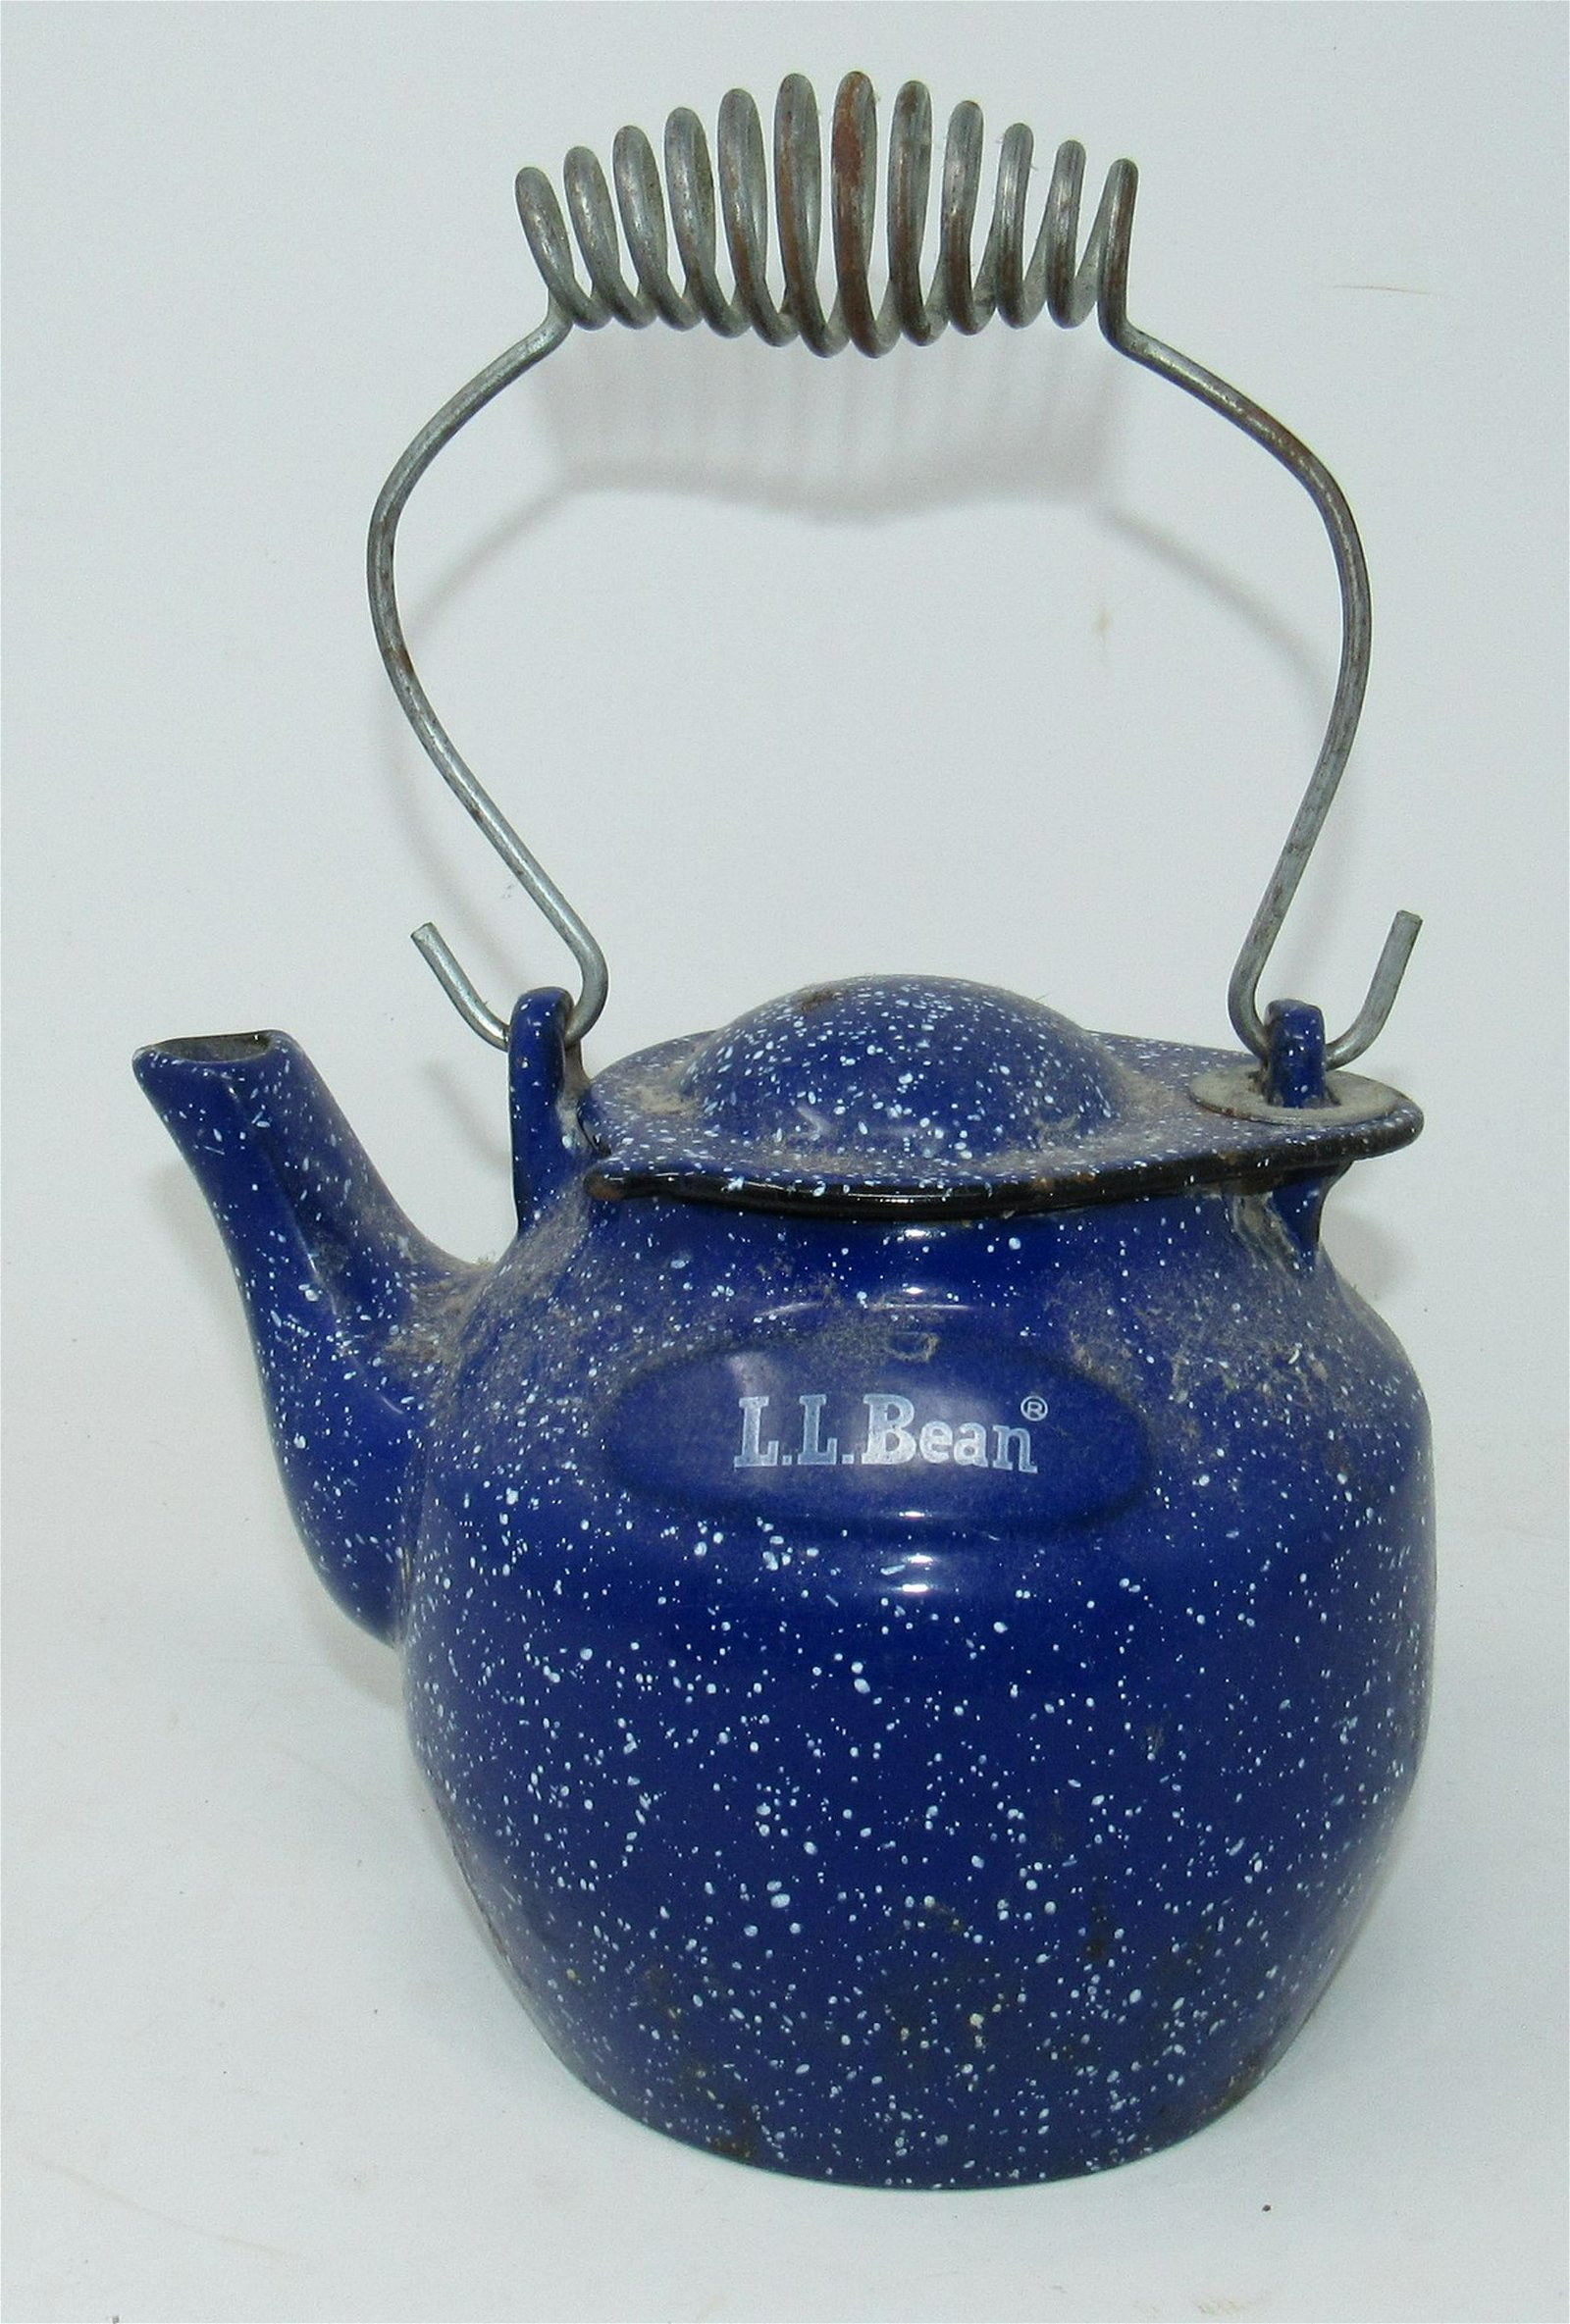 L.L. Bean Cast Iron Enameled Teapot